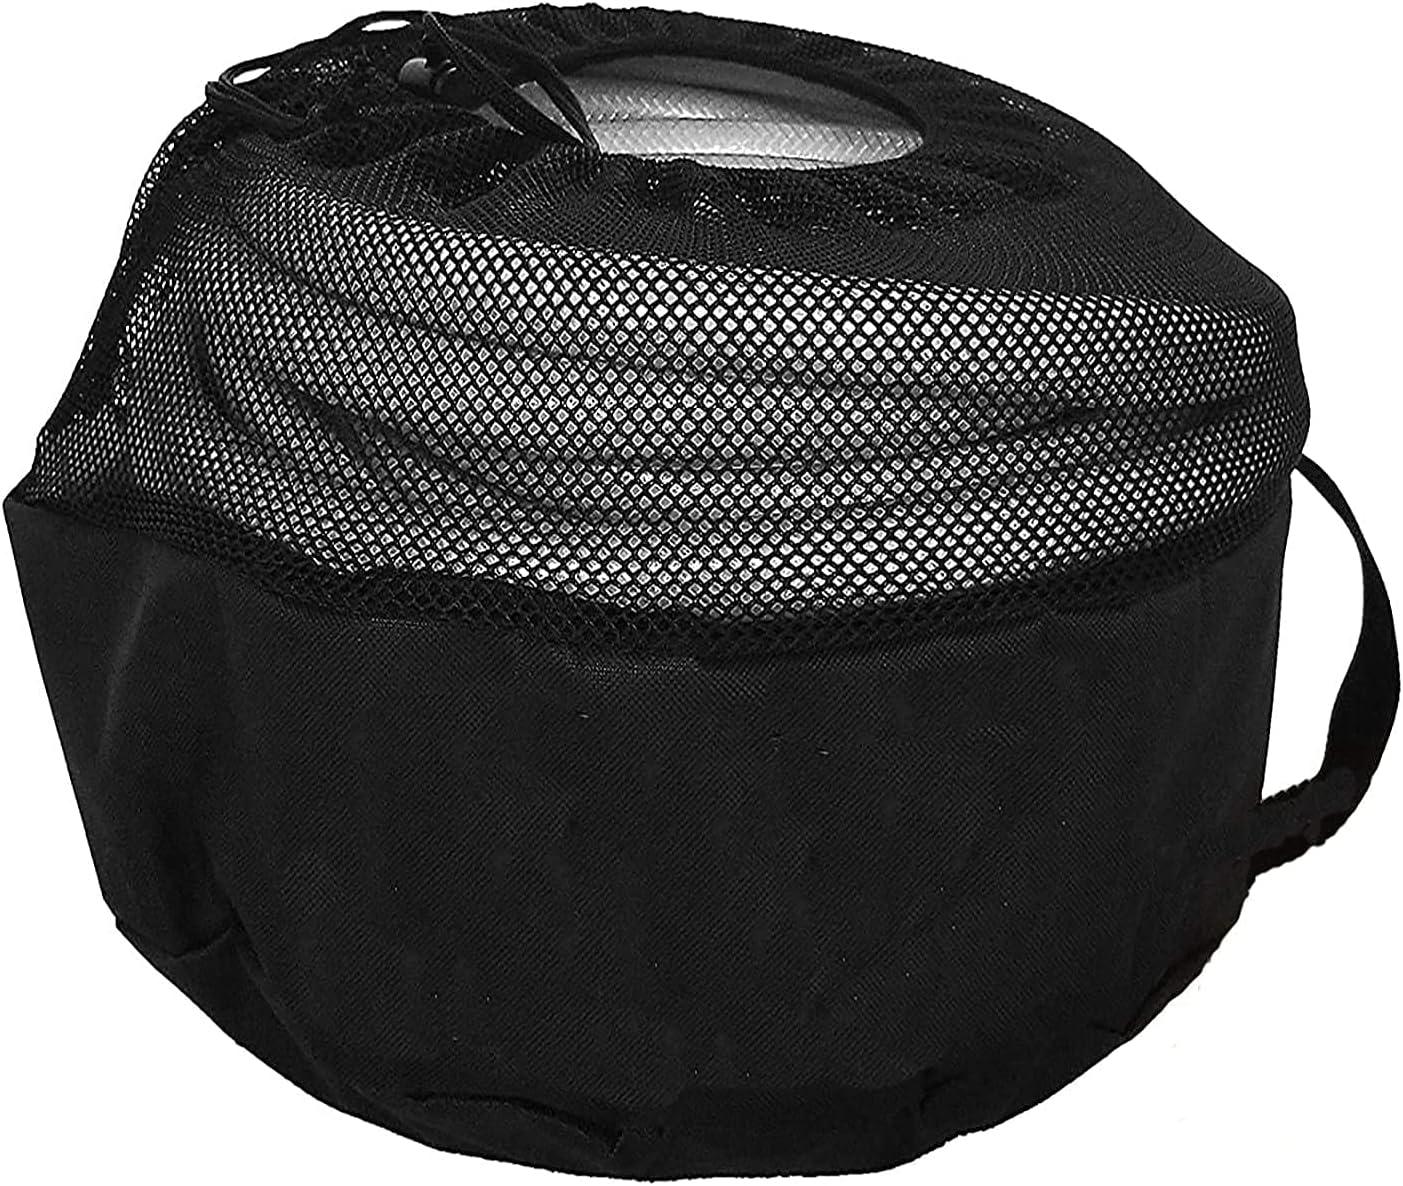 Suvunpo RV Hose Storage Handy Equipment Max 45% OFF excellence Garden Sto Bag